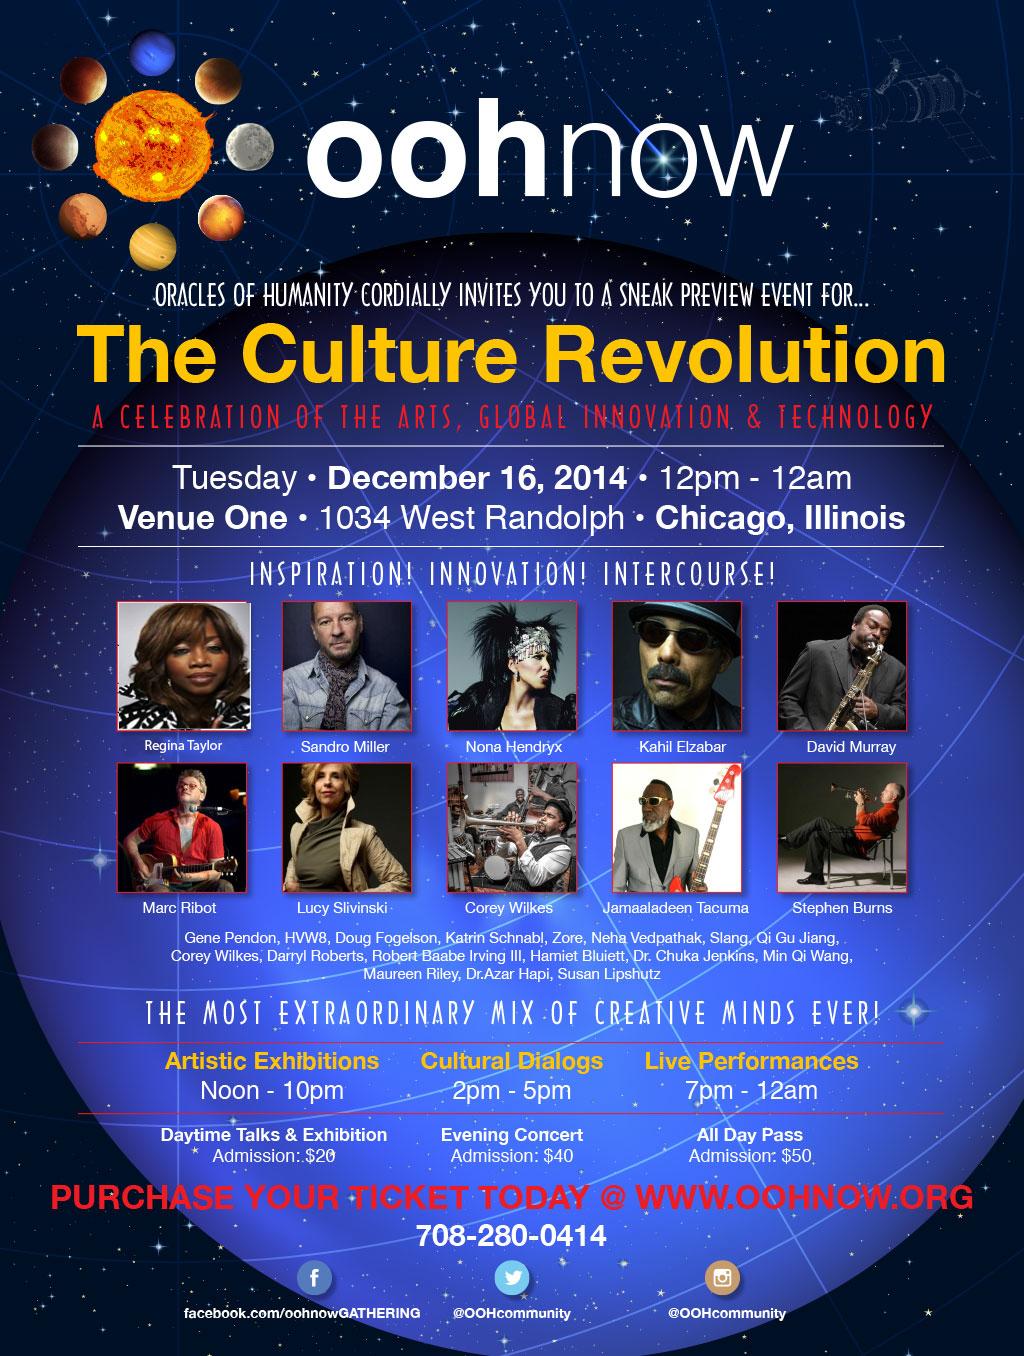 OOHnow The Culture Revolution